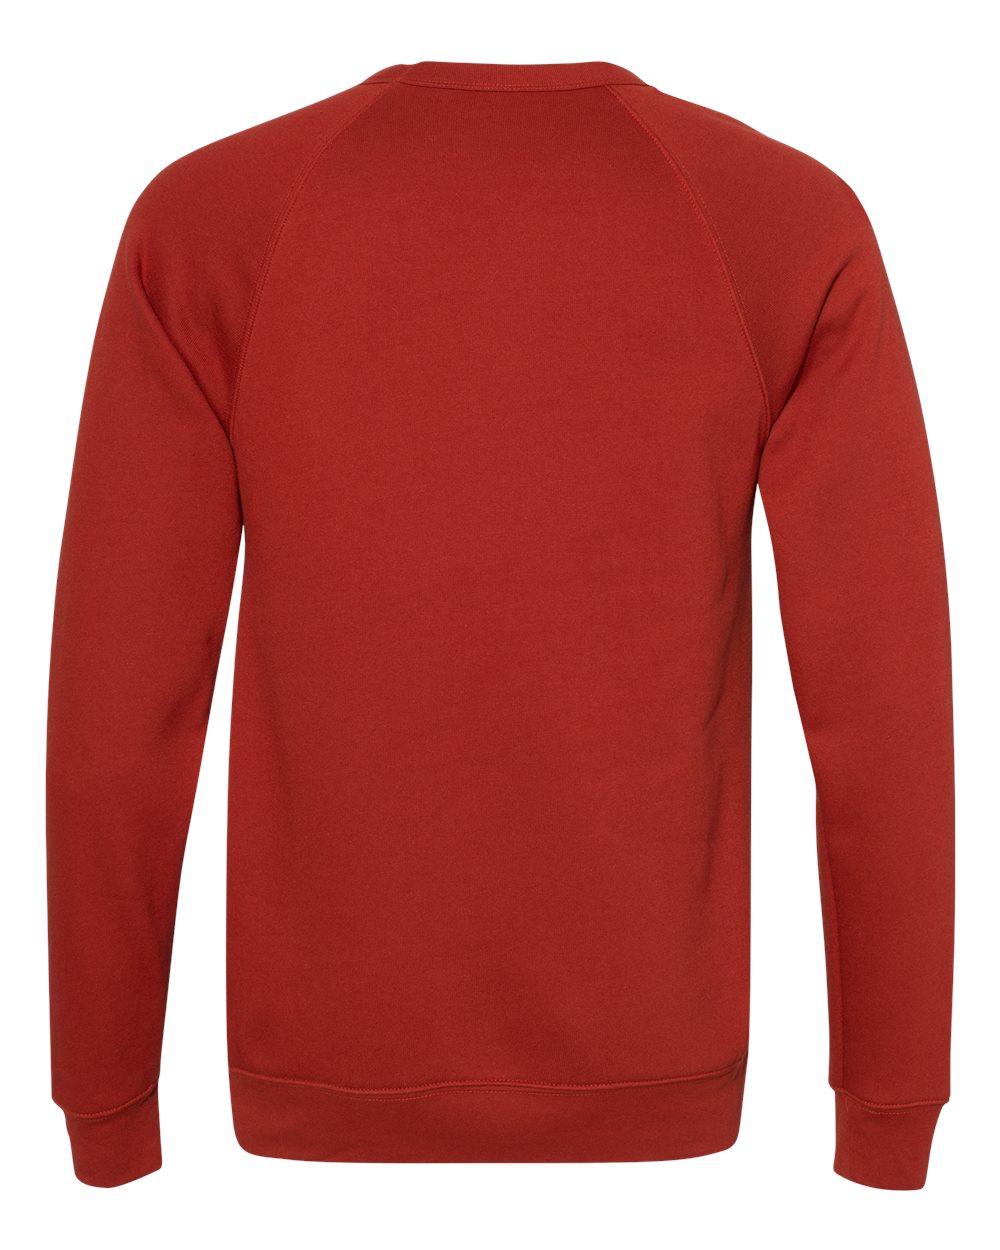 Bella-Canvas-Unisex-Sponge-Fleece-Crewneck-Sweatshirt-Top-Blank-3901-up-to-2XL thumbnail 16